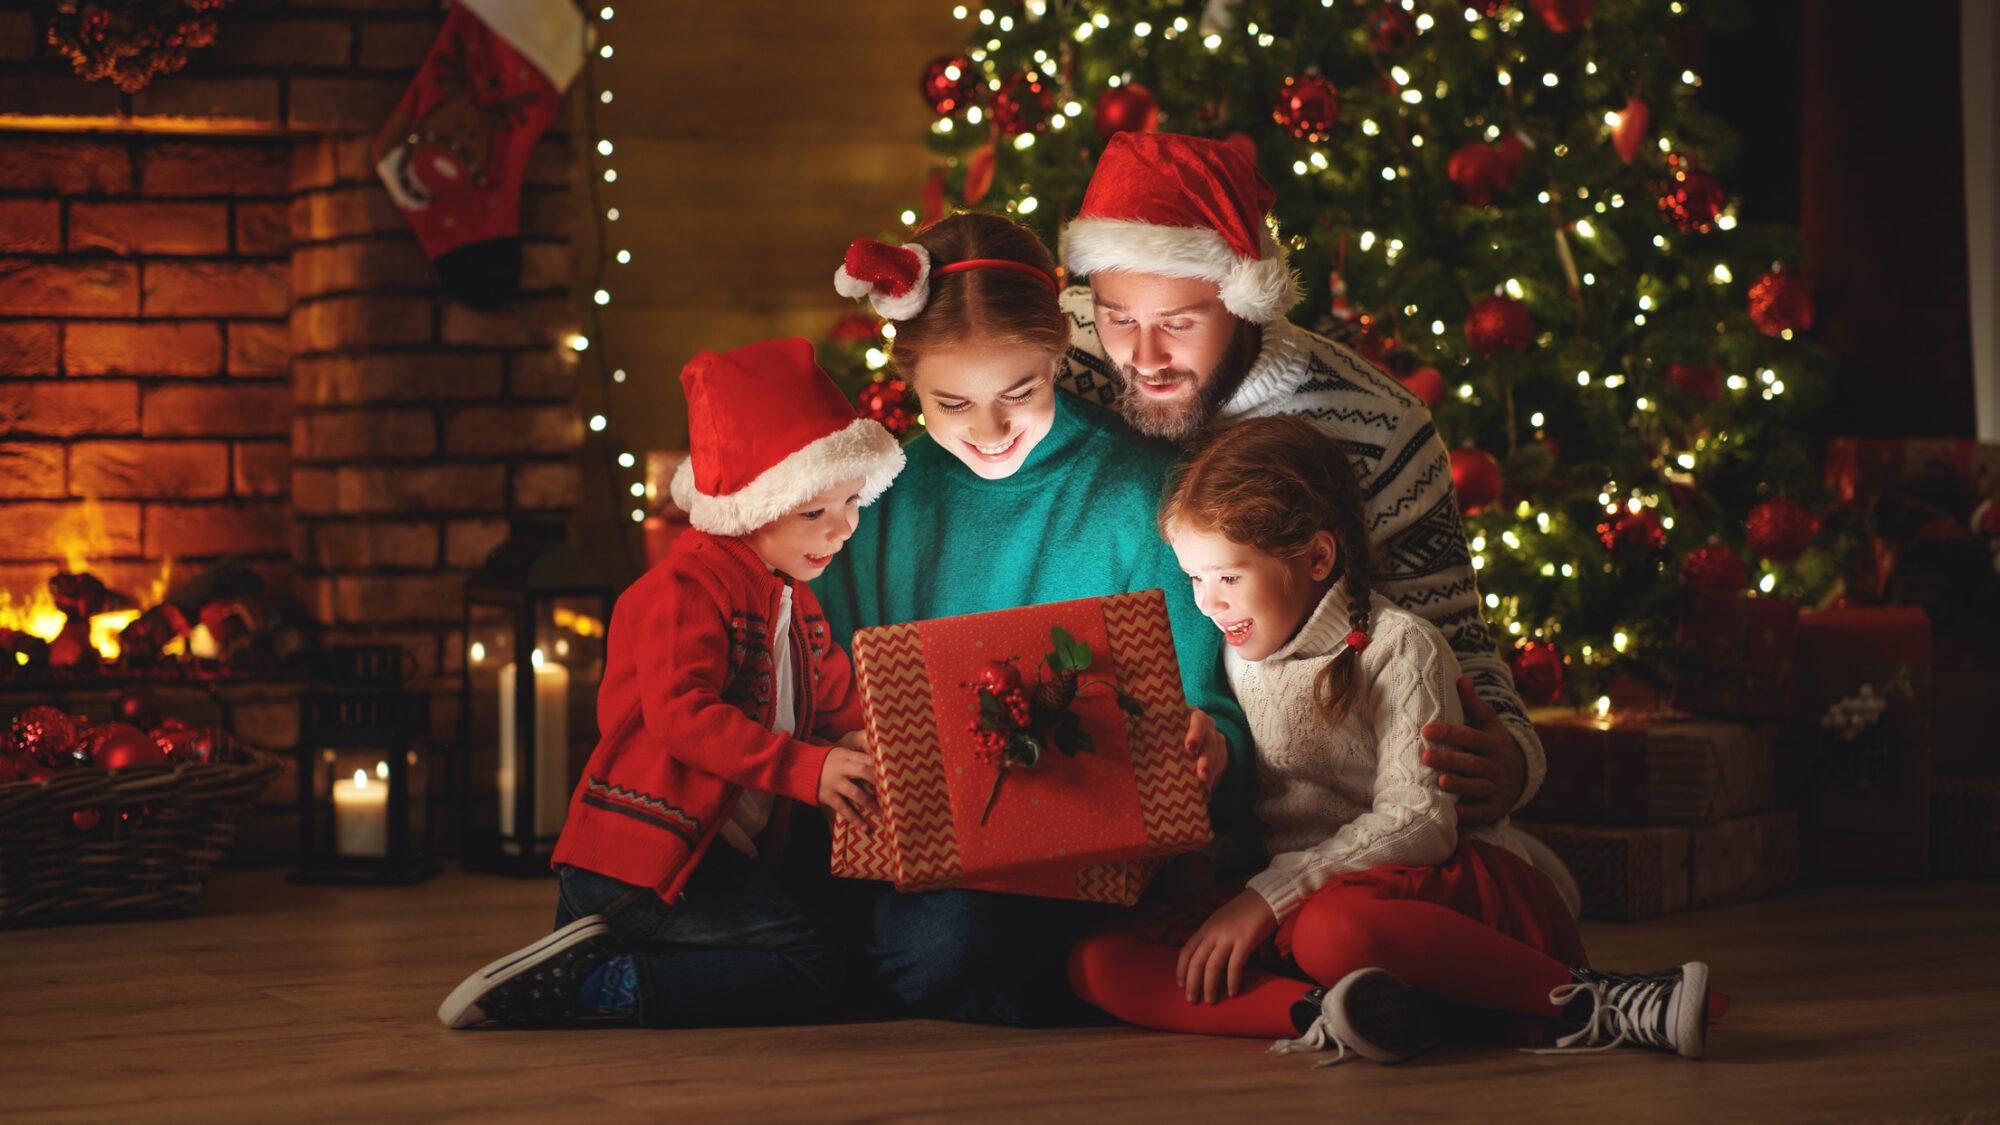 Neste Natal prefira presentes sustentáveis